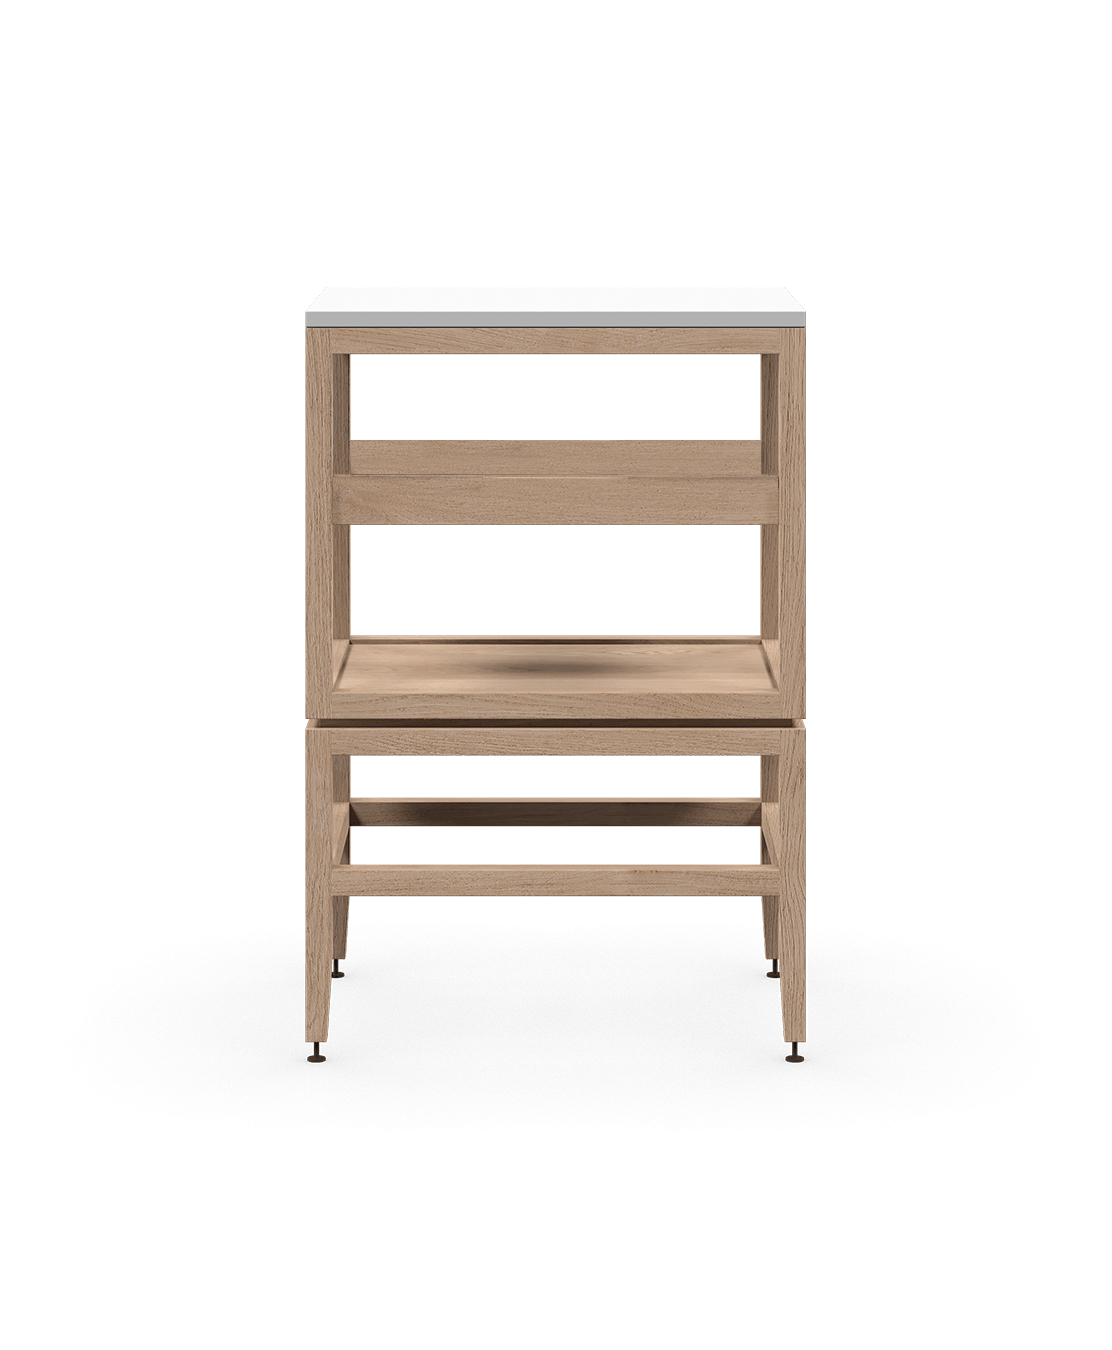 coquo volitare white oak solid wood modular cube 1 shelf storage open cabinet 18 inch C2-N-1824-001W1-NA